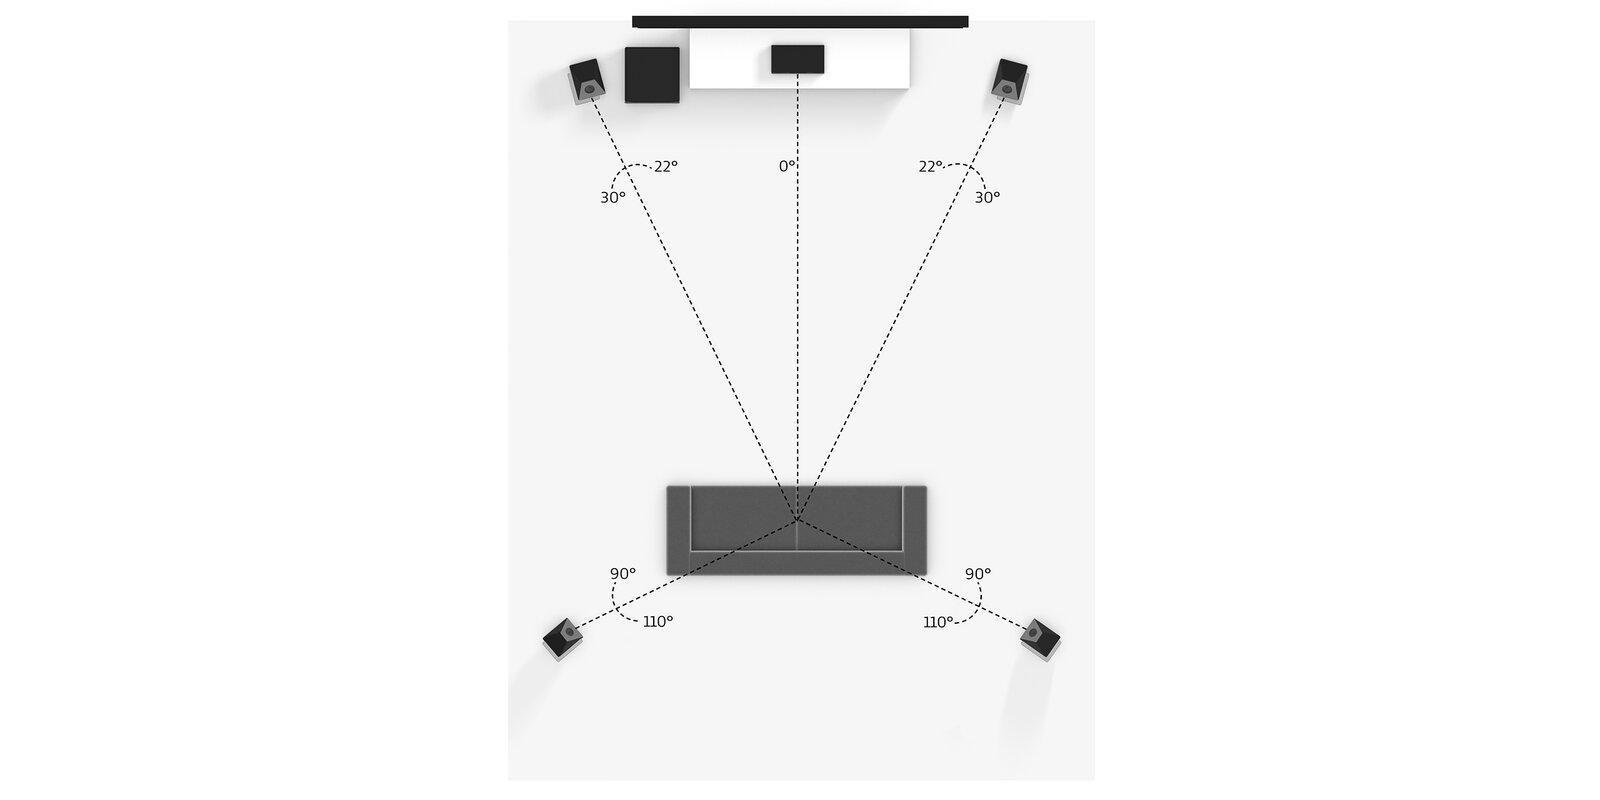 dolby_SpeakerPlacement_514_Upfiring-Flat-2560x1280.jpg